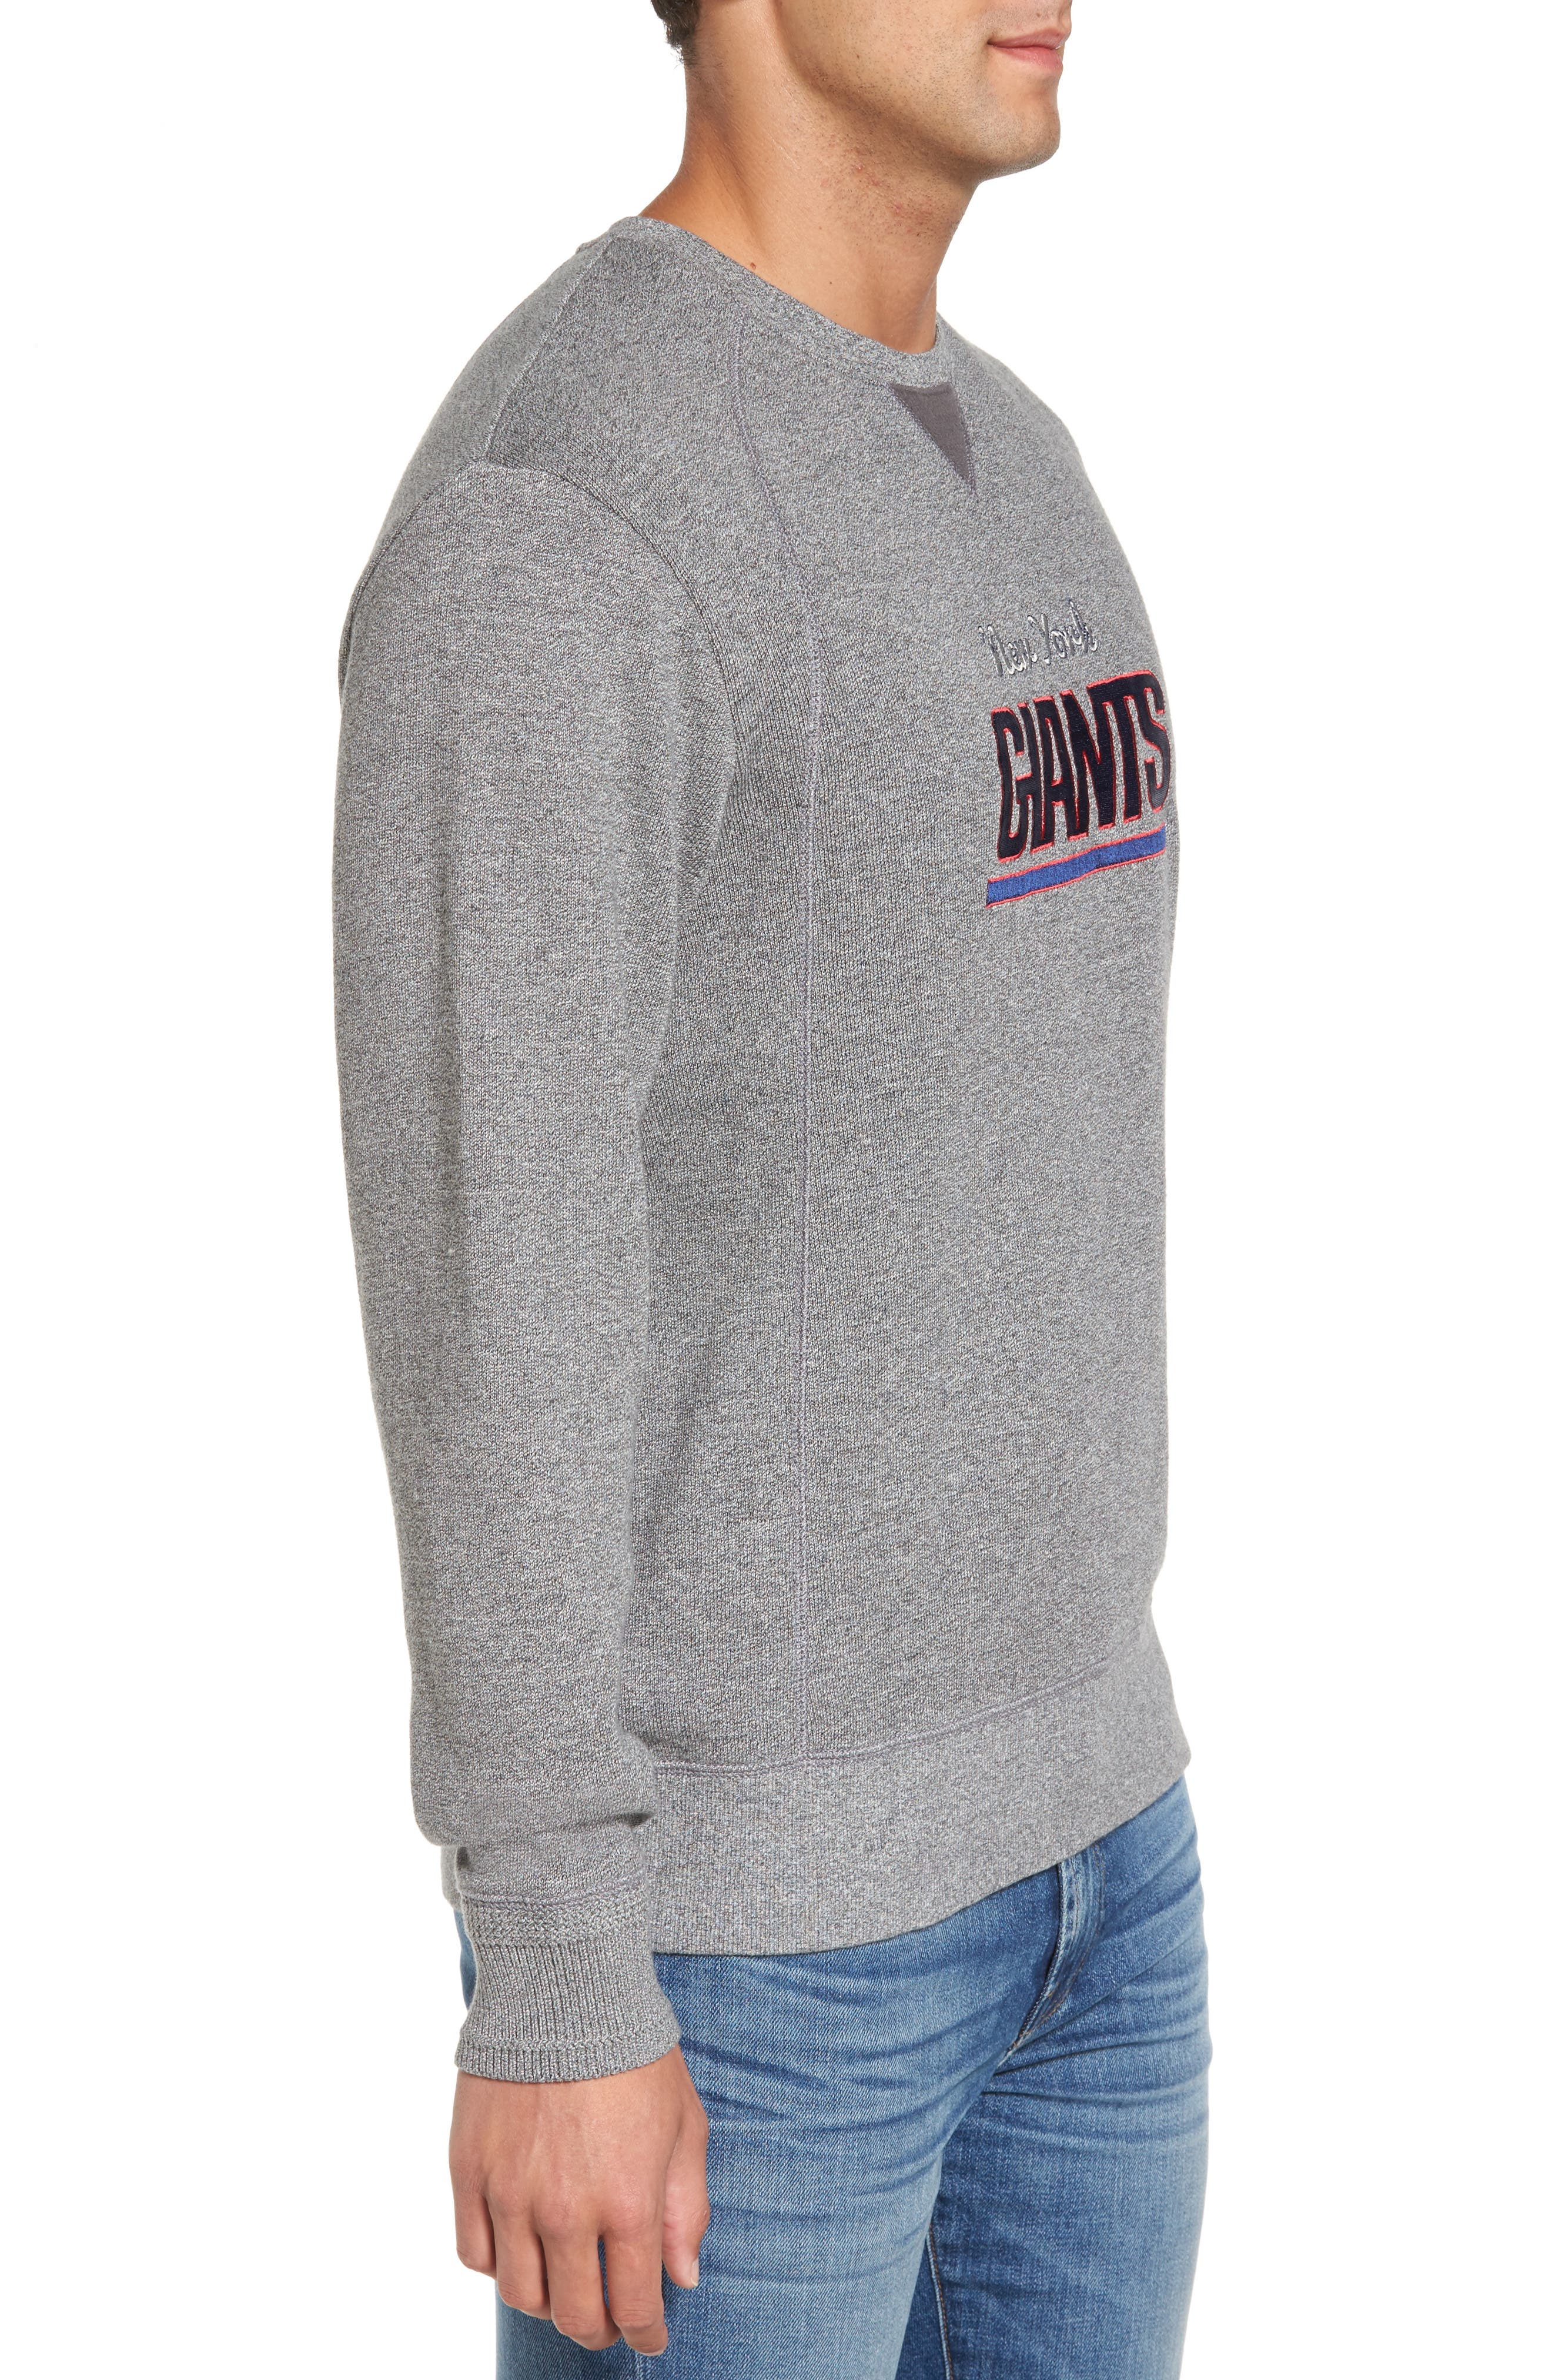 NFL Stitch of Liberty Embroidered Crewneck Sweatshirt,                             Alternate thumbnail 81, color,